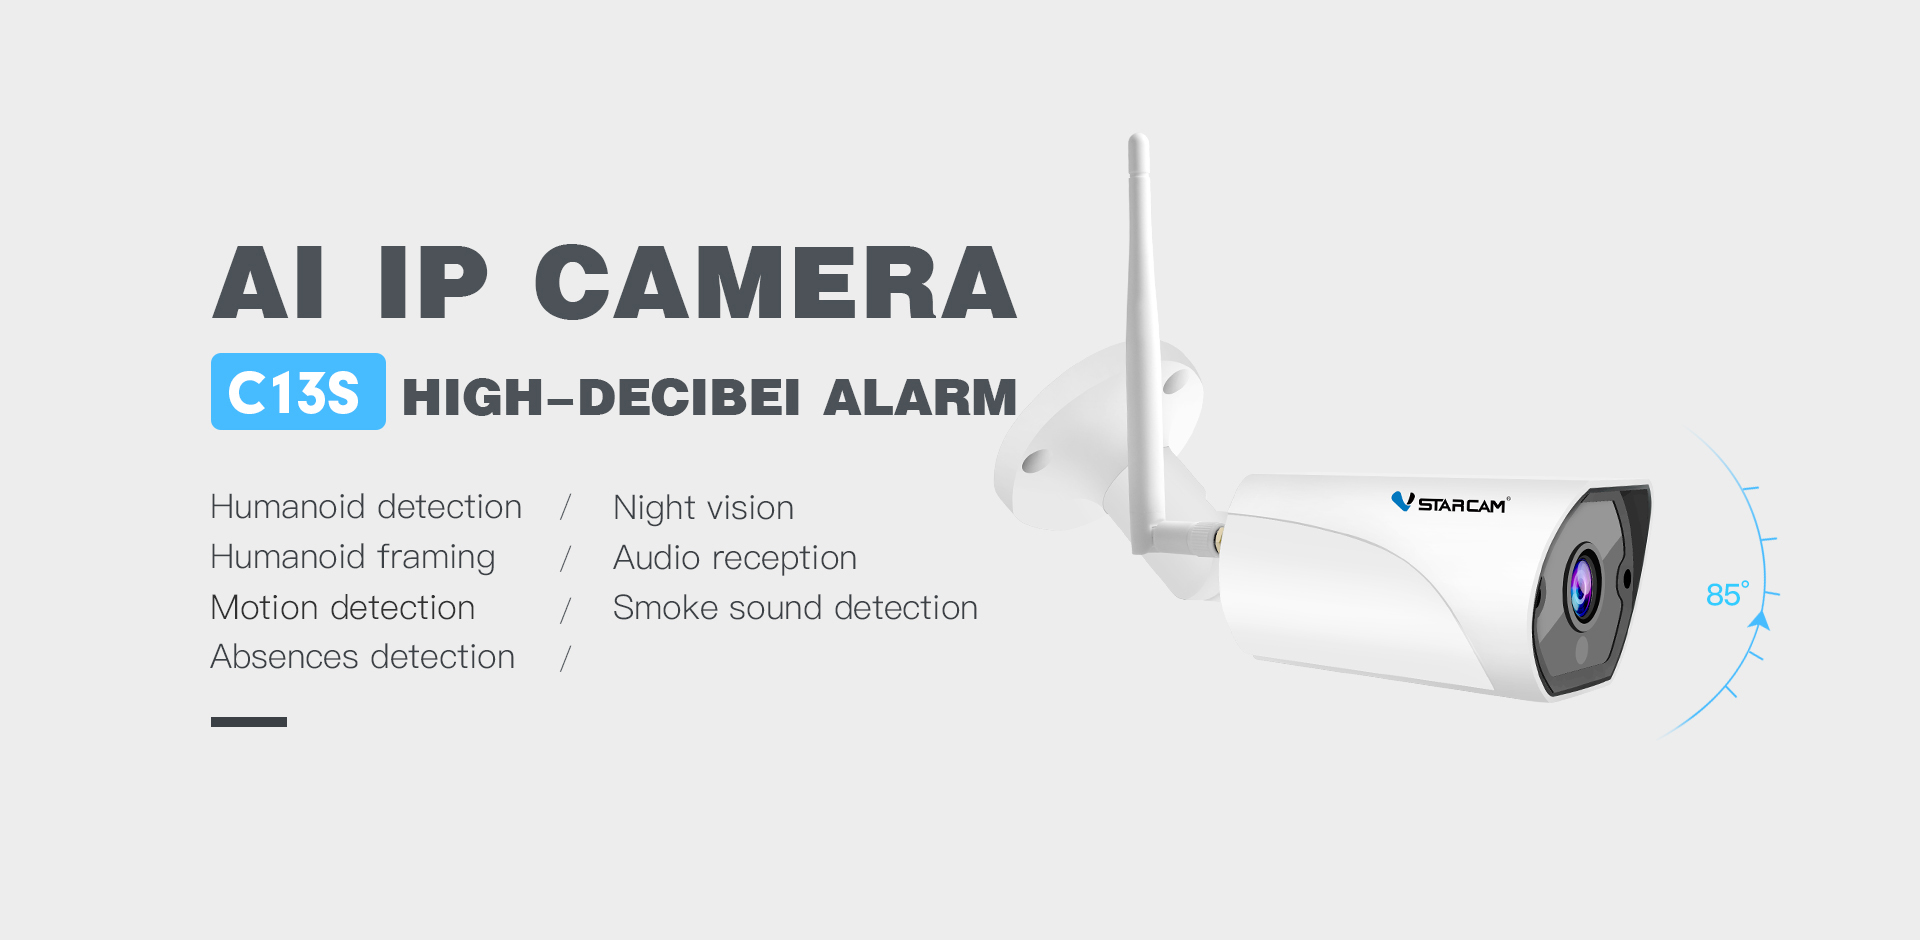 Waterproof Bullet Camera